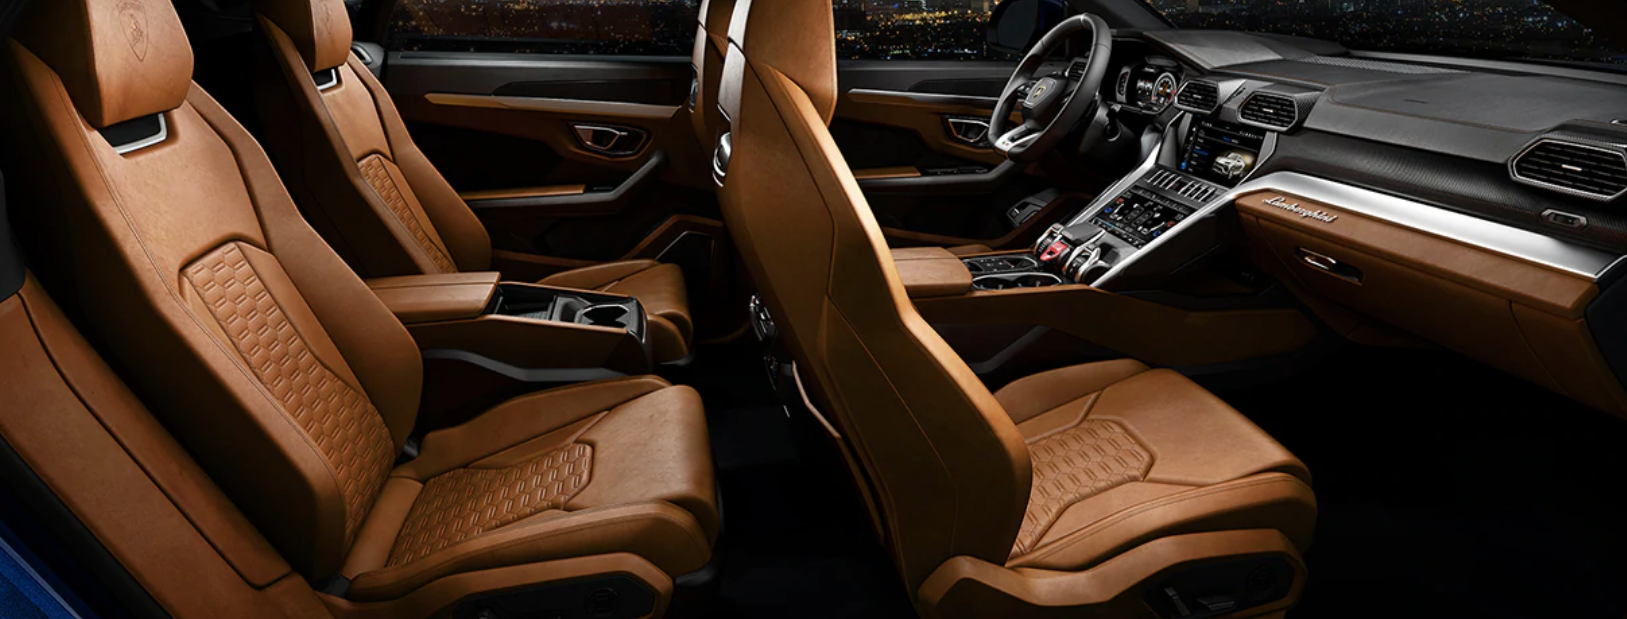 Interior of the Lamborghini SUV Urus: A Look Inside